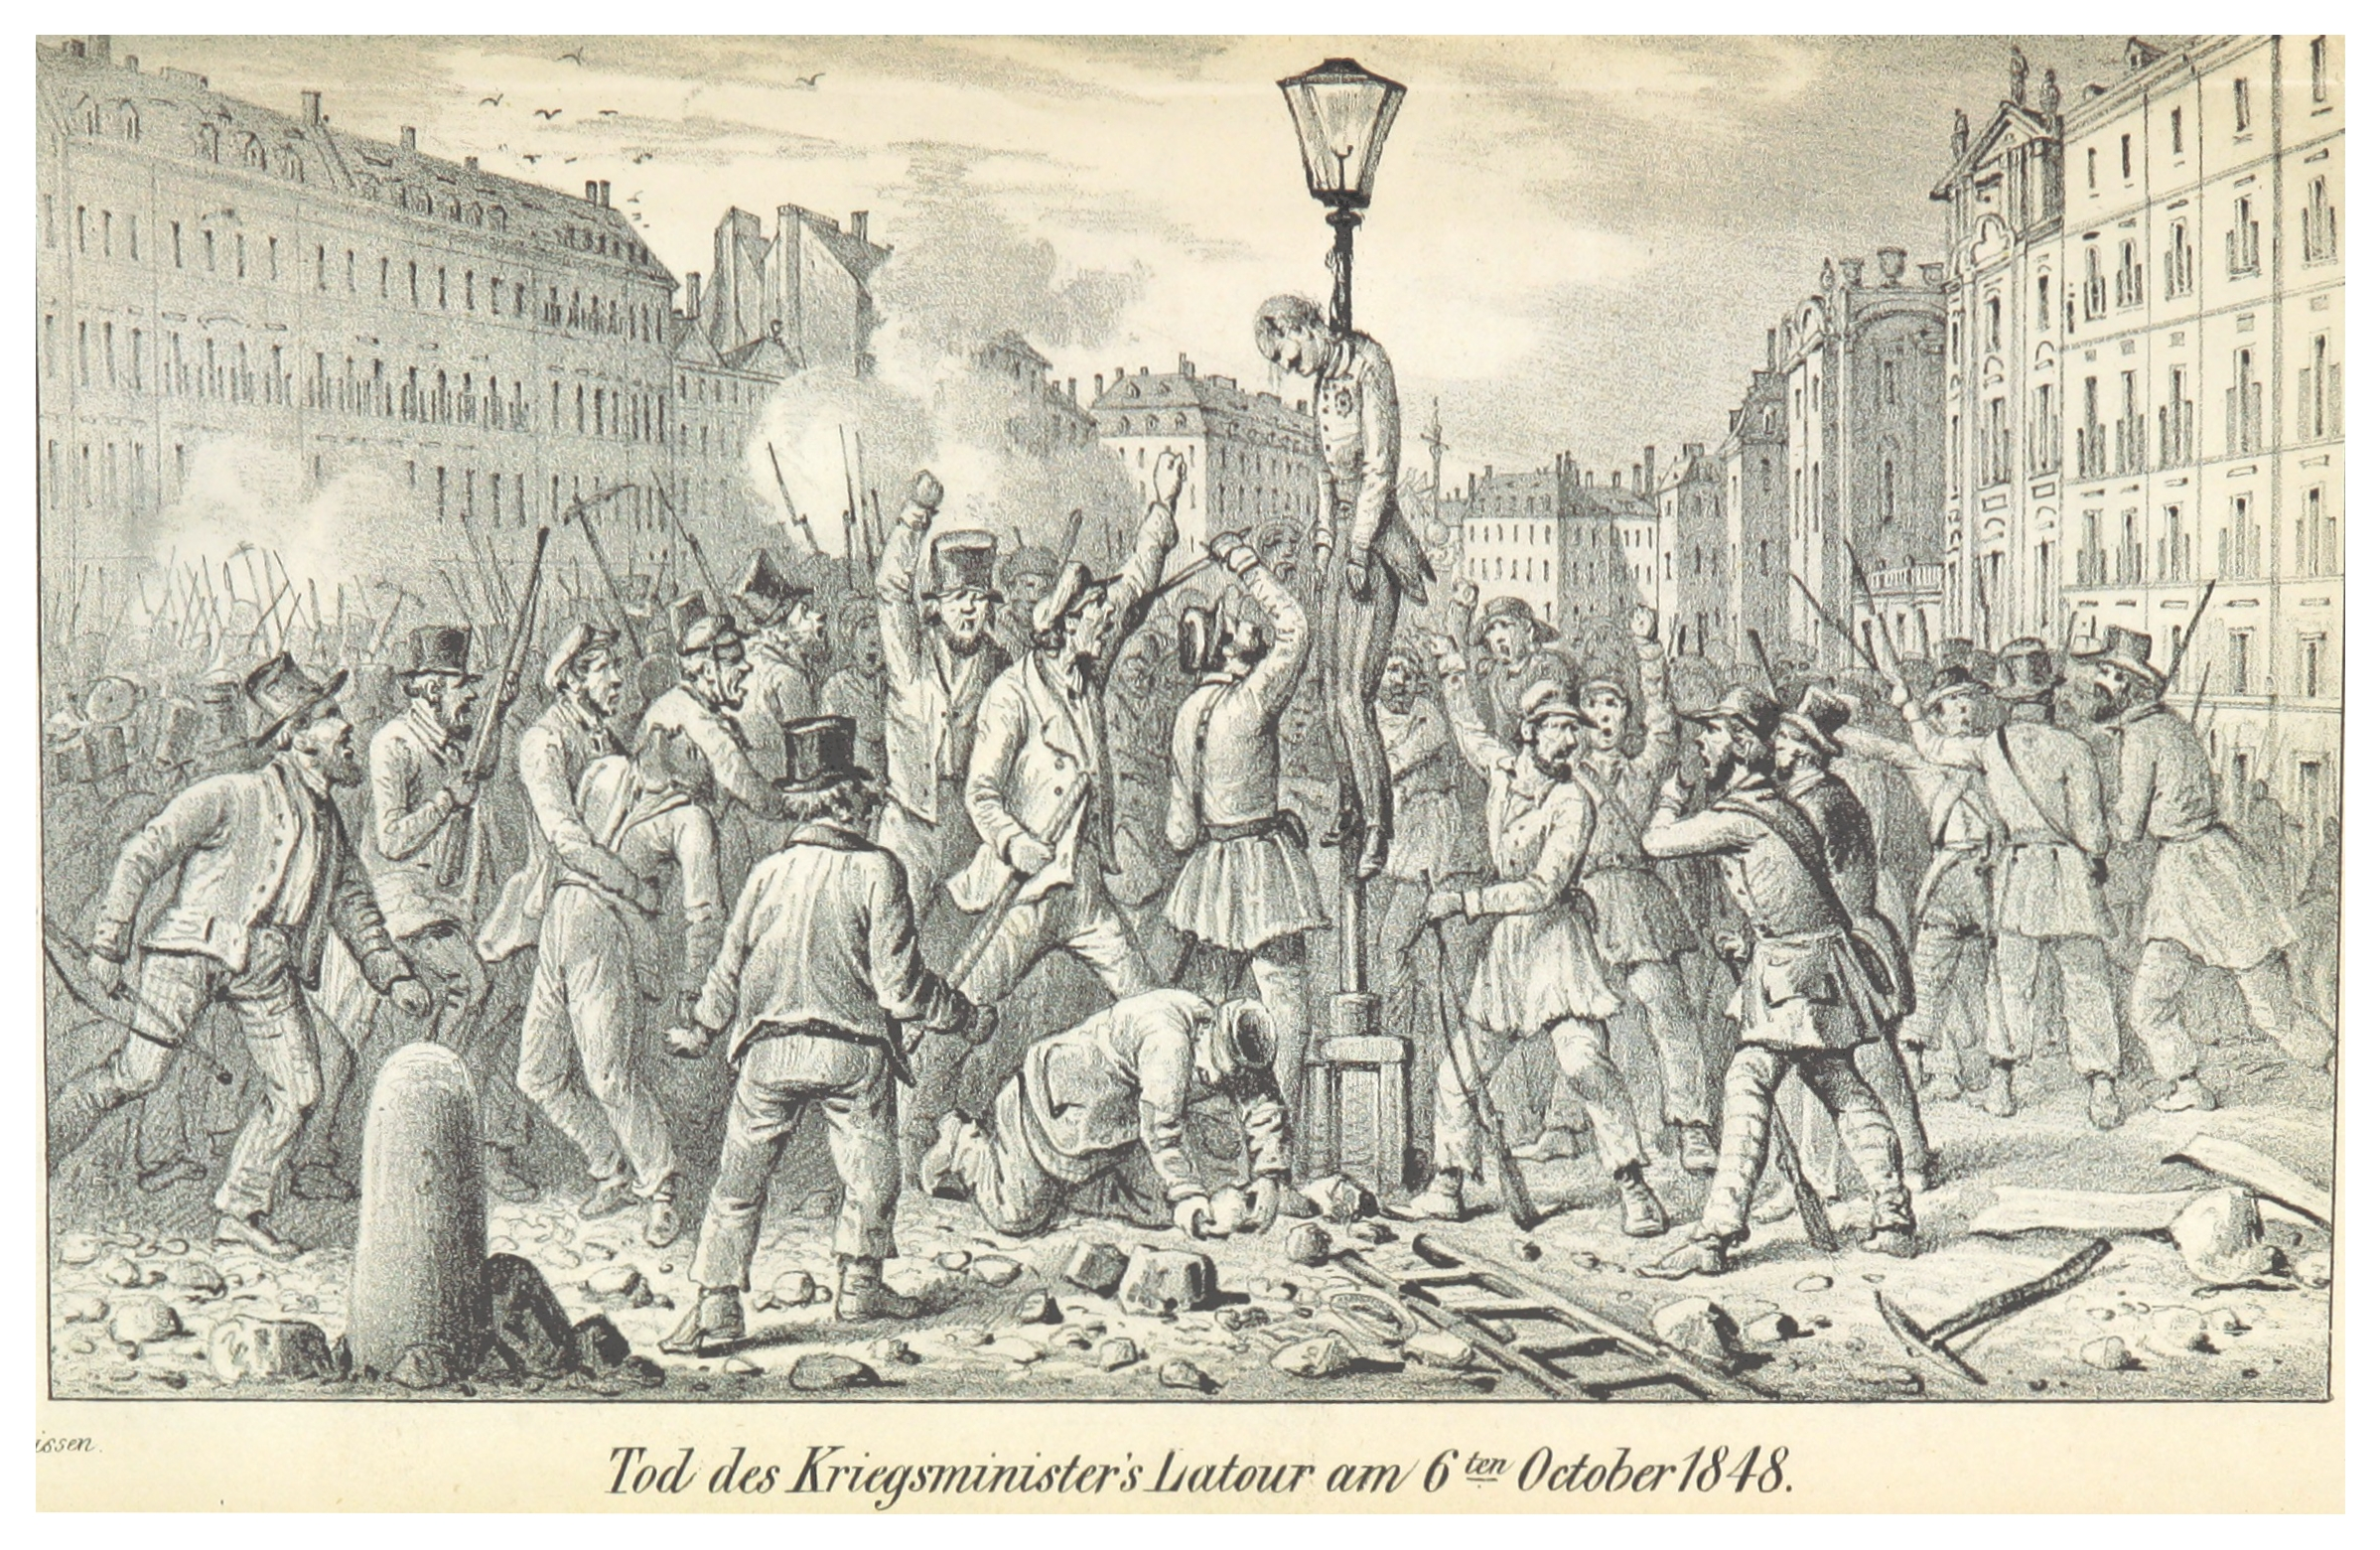 wien_im_october_1848_p041_tod_des_kriegsministers_latour_am_6_oktober_1848.jpg